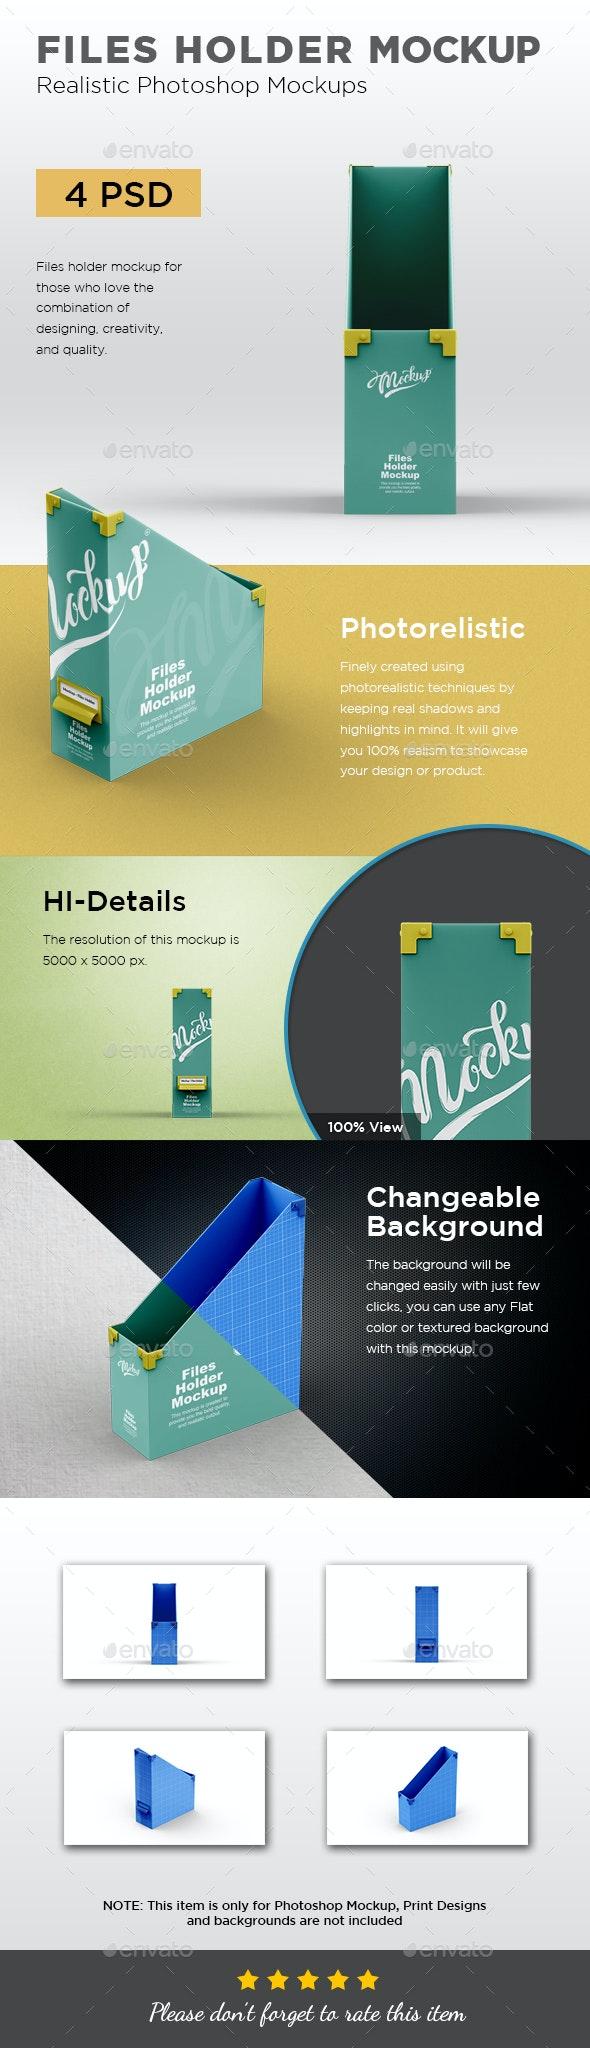 Files Holder Mockup - Product Mock-Ups Graphics